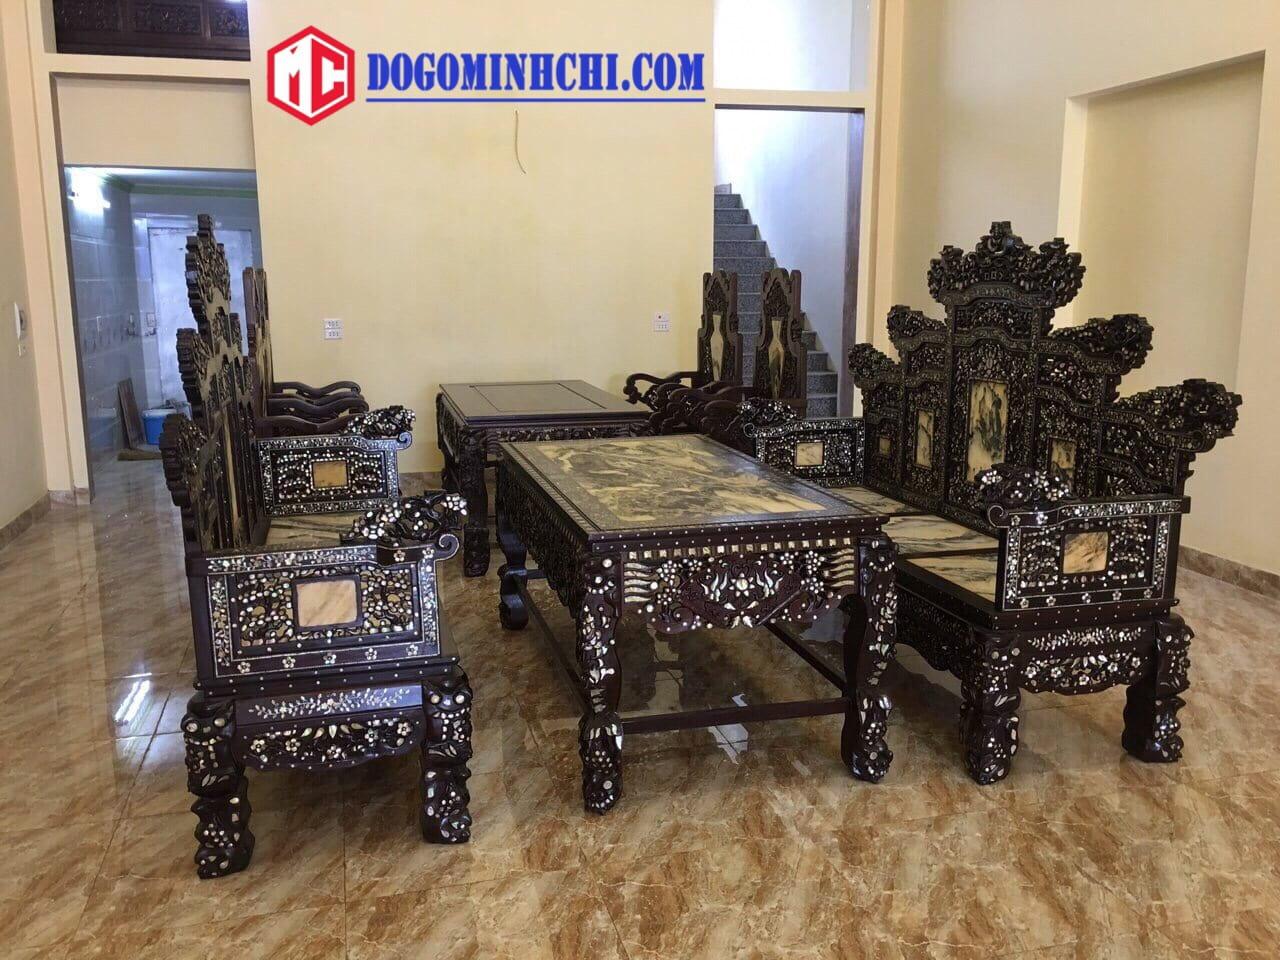 bo-ghe-truong-ky-dai-son-kham-can-oc-hang-vip-1